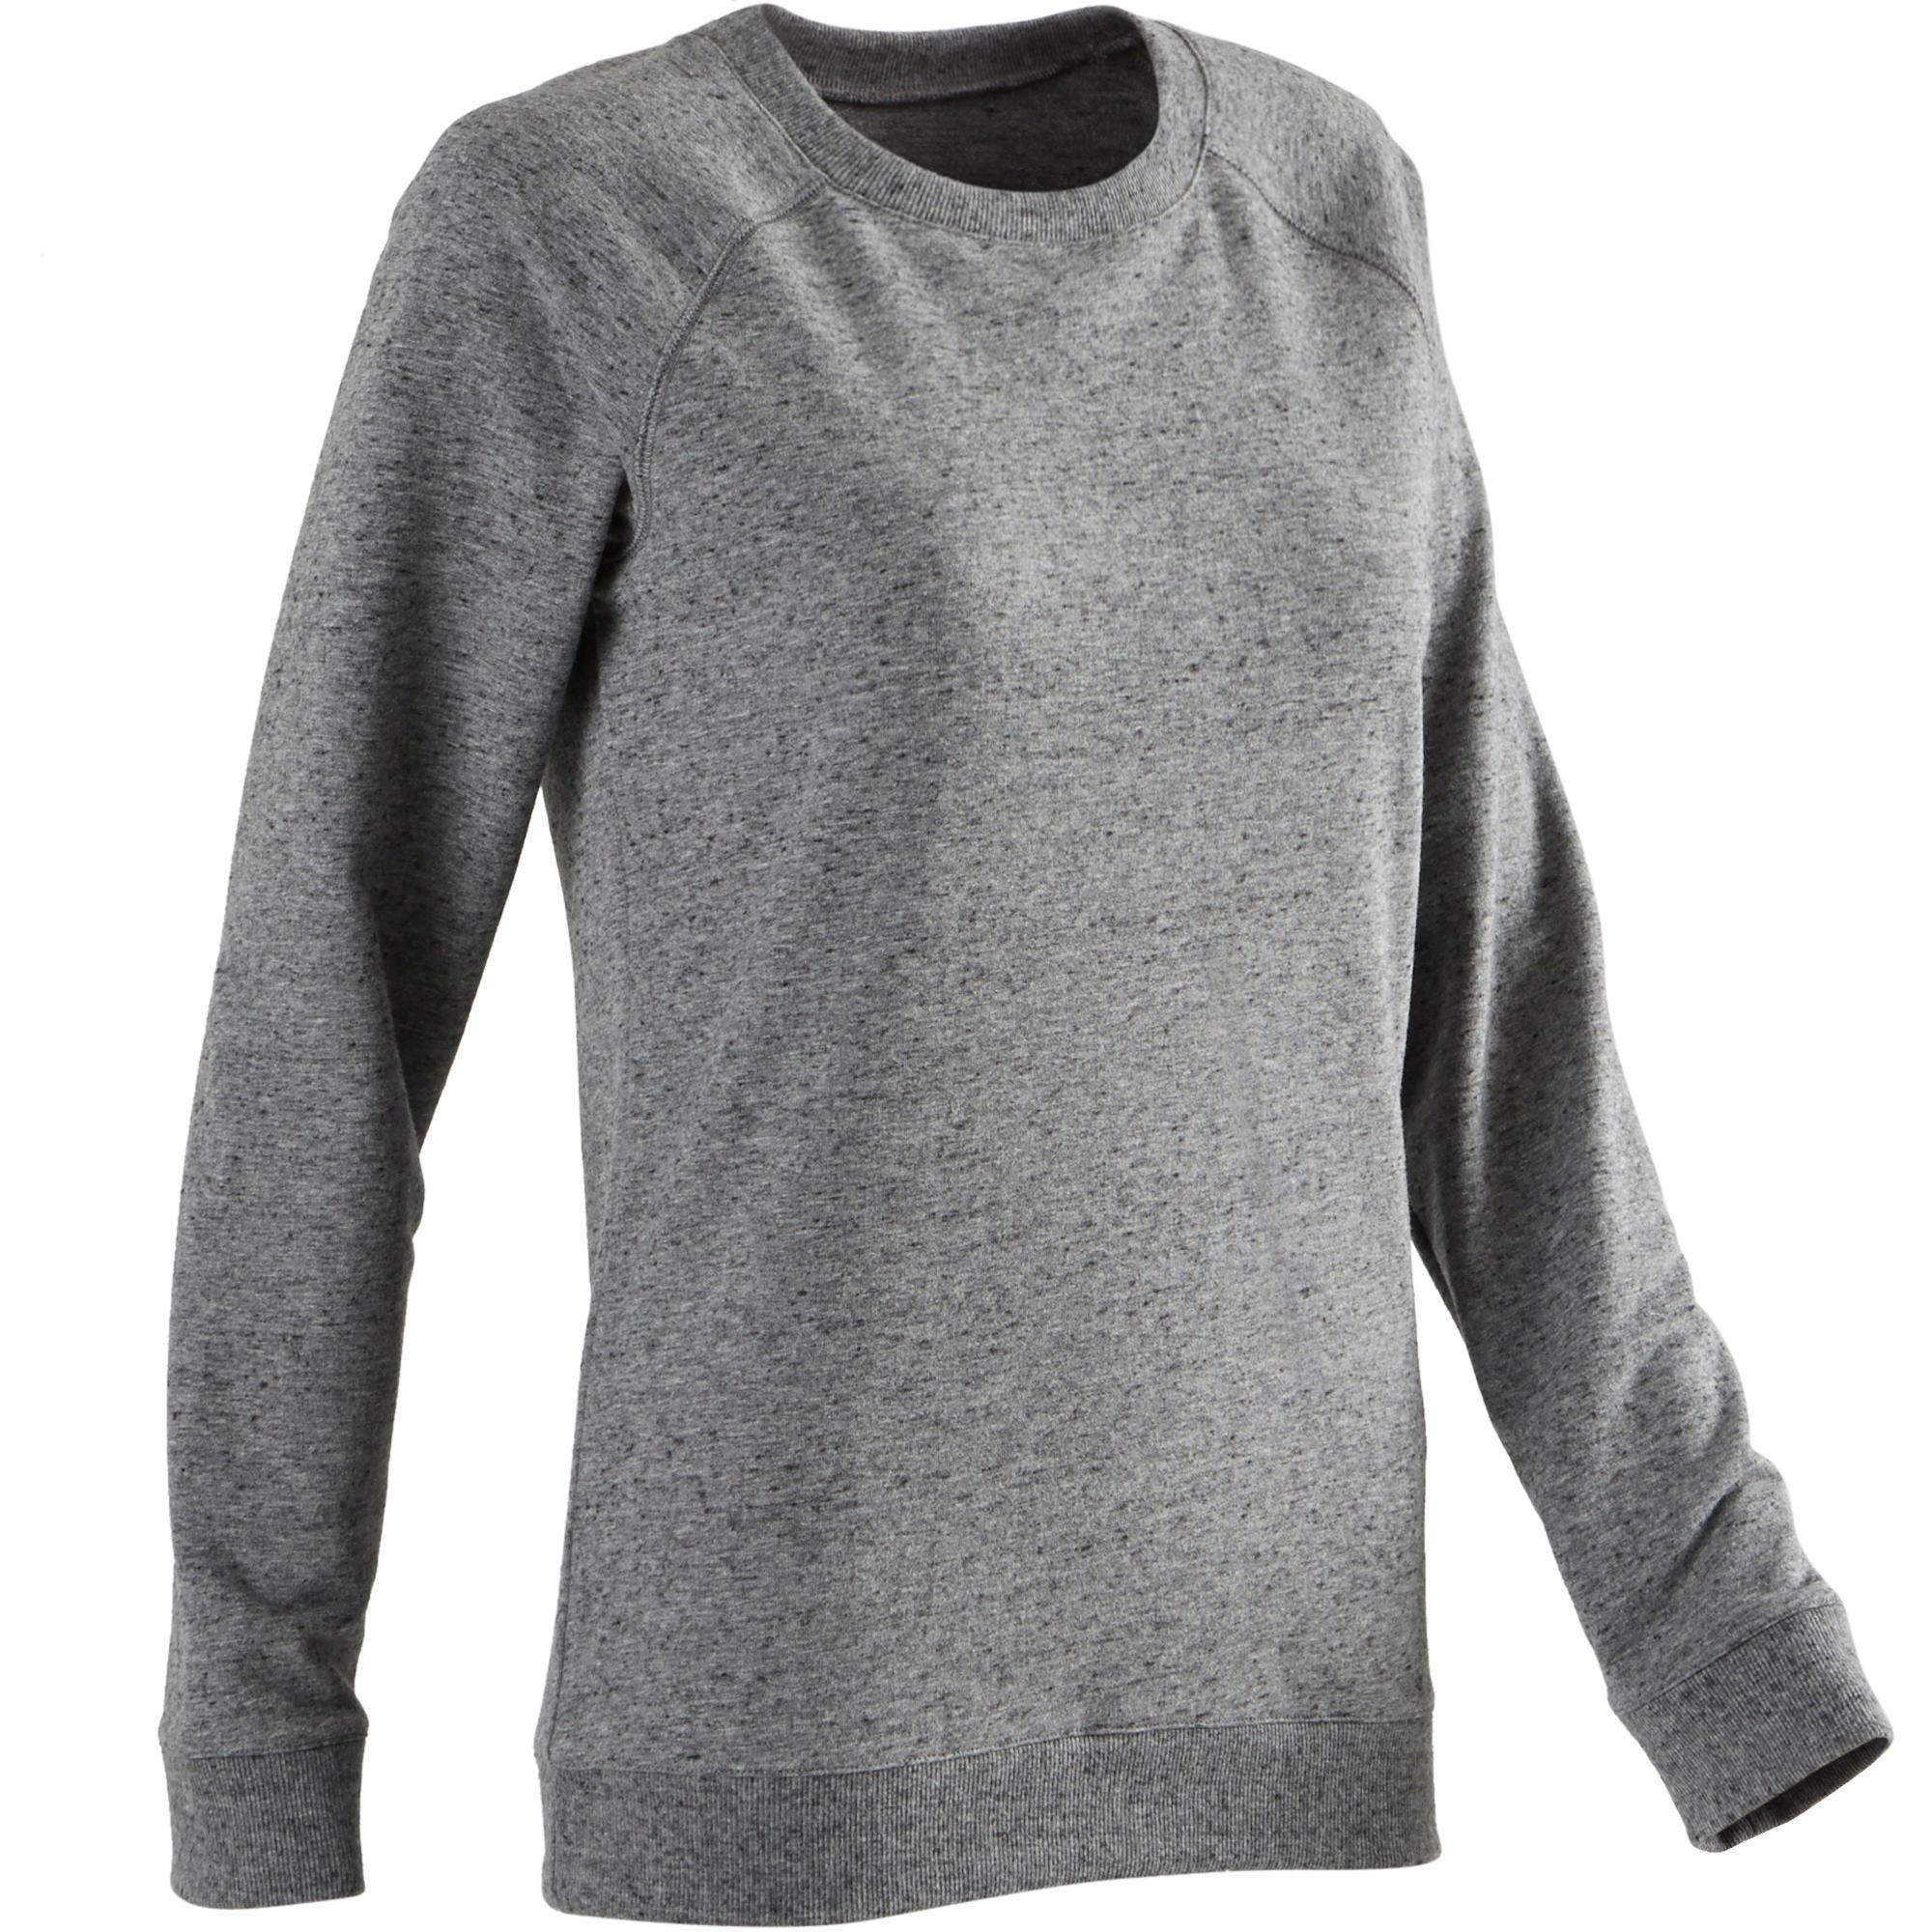 Domyos Sweater 500 pilates en lichte gym dames gemêleerd donkergrijs